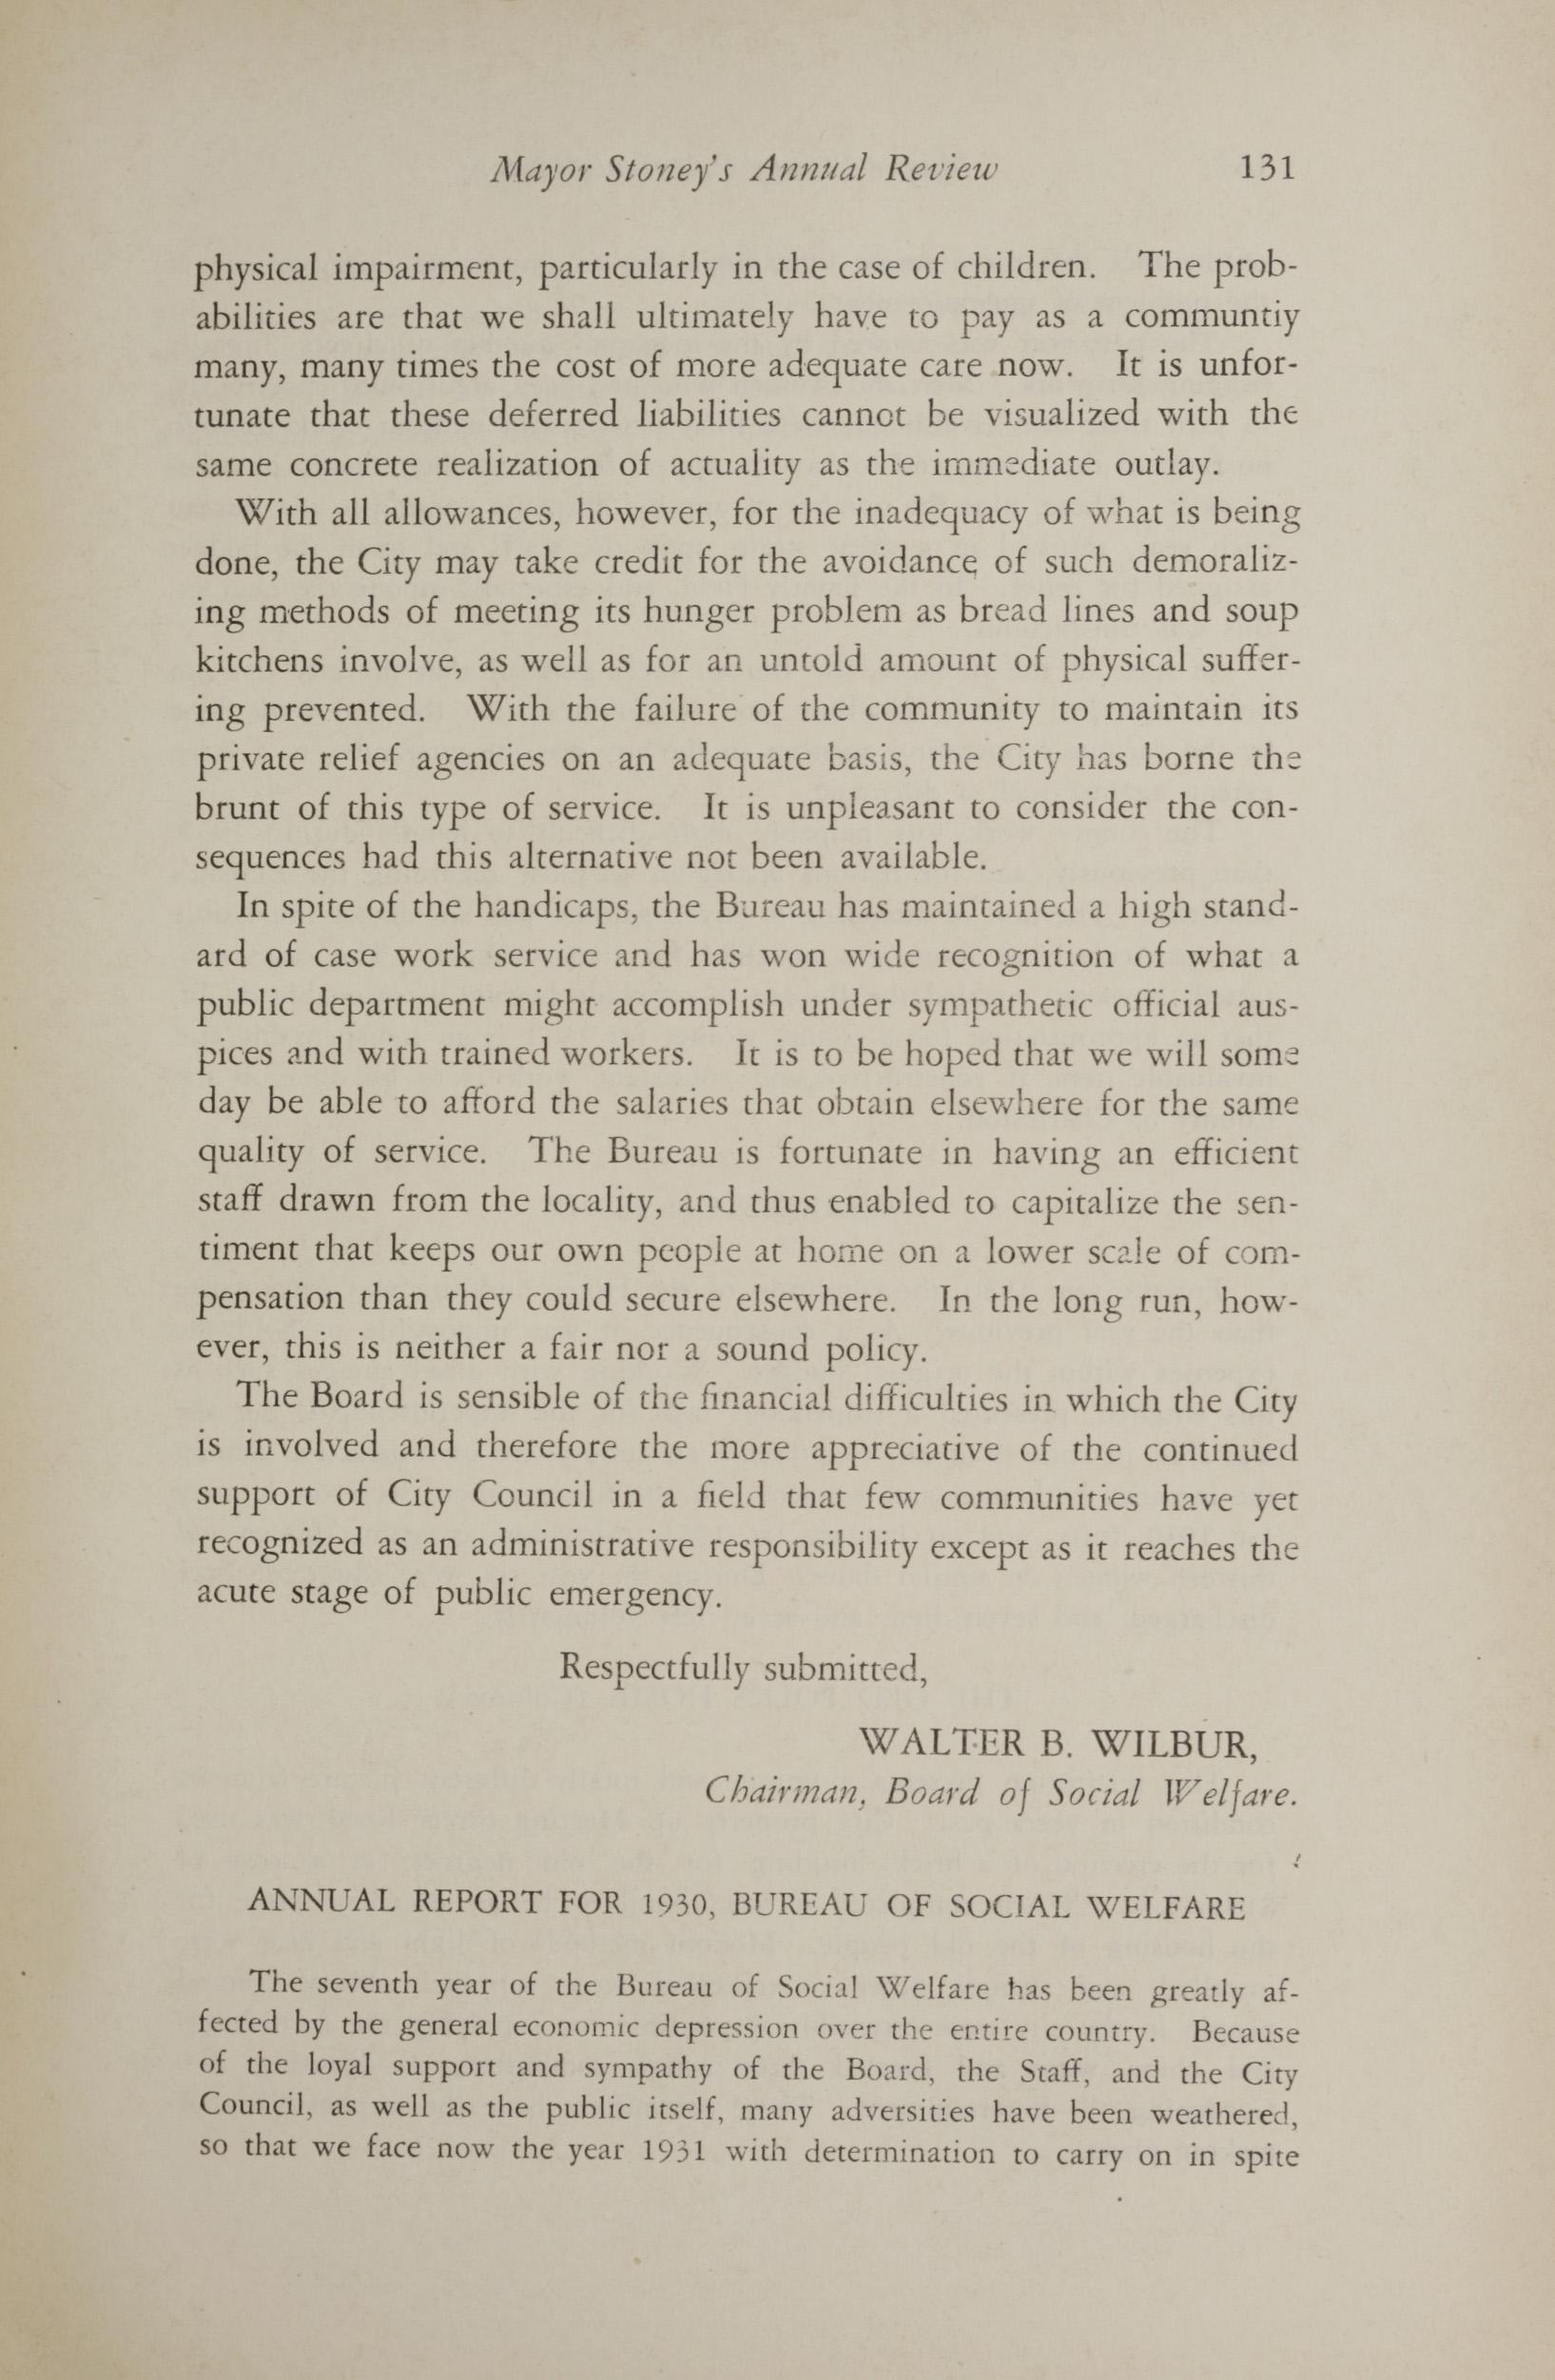 Charleston Yearbook, 1930, page 131